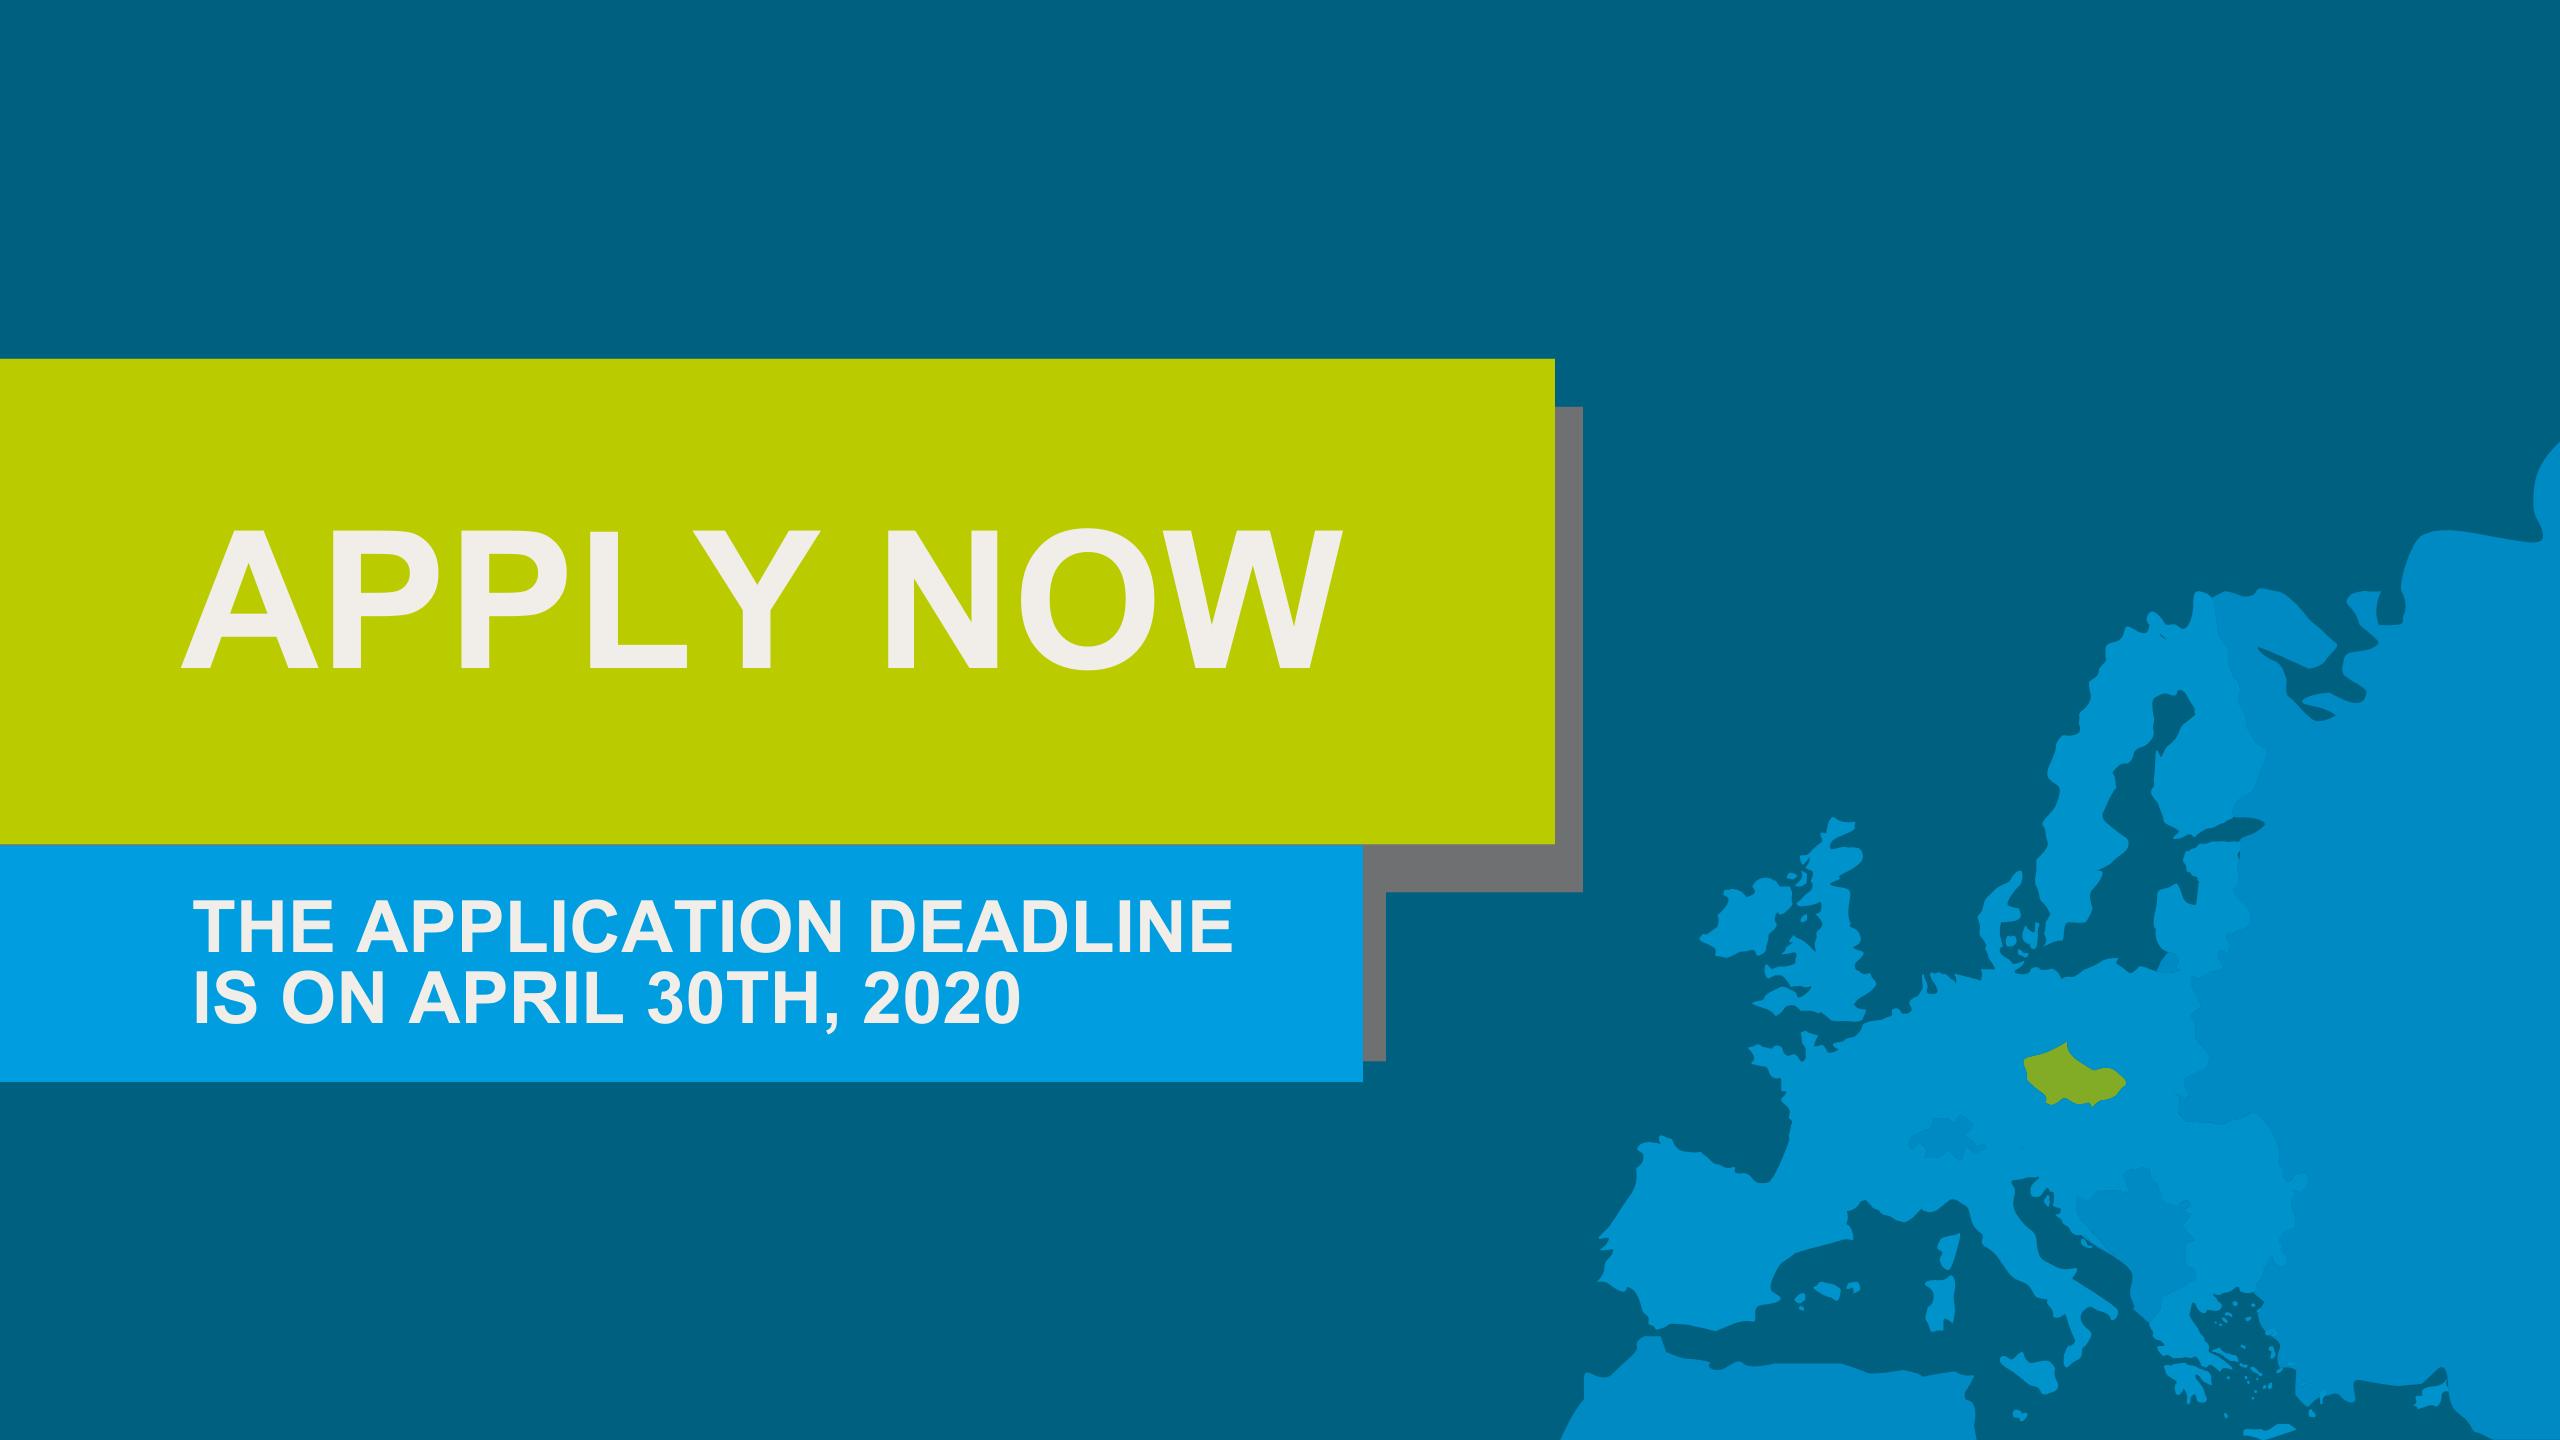 MIMG Application Deadline on April 30